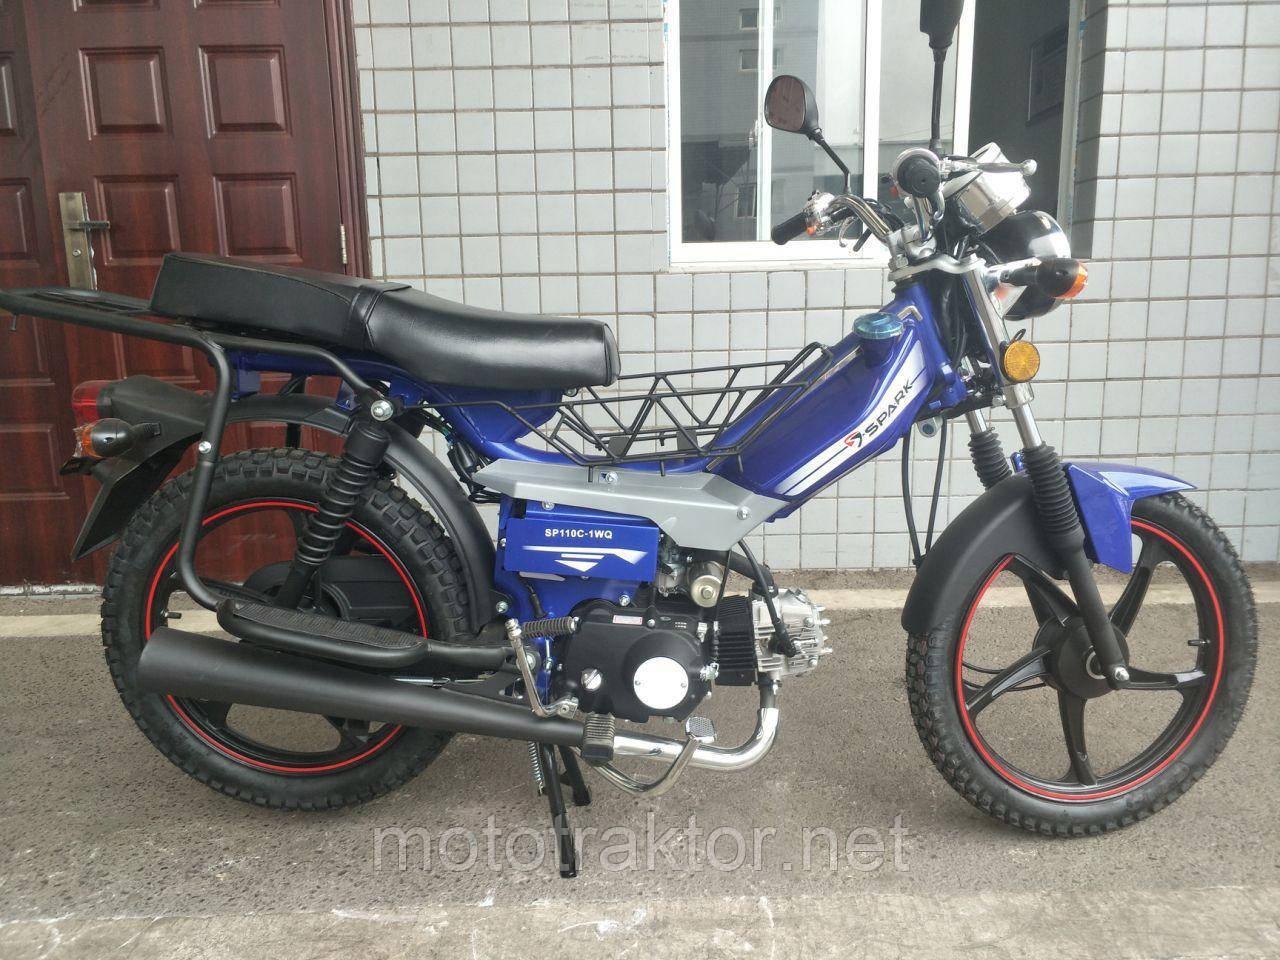 Мотоцикл SPARK SP110C-1WQ